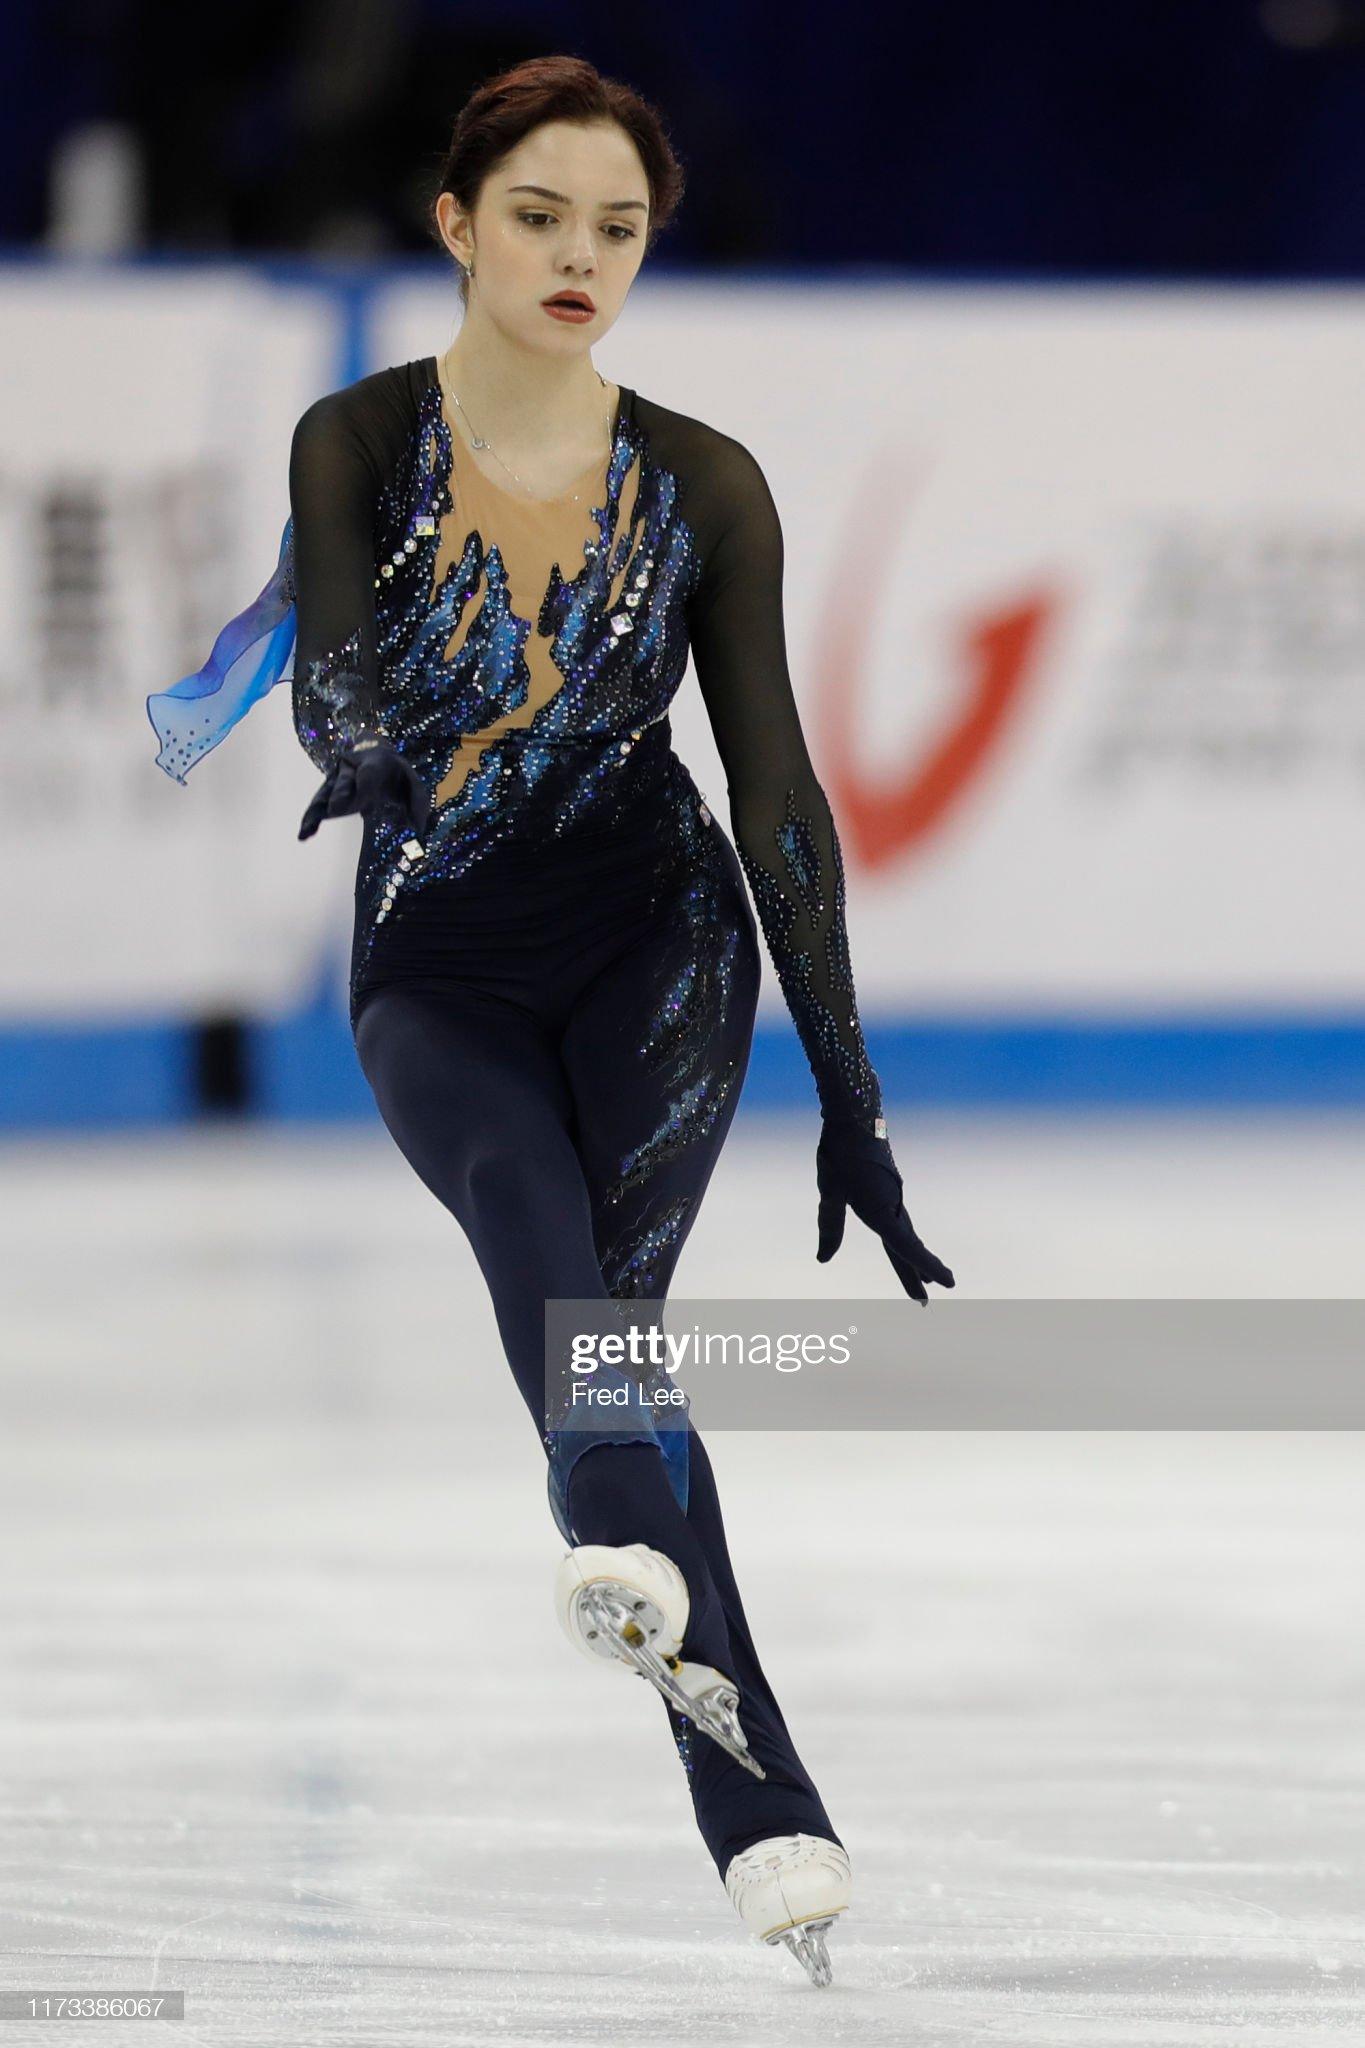 Shanghai Trophy (Invitational). 3-5 октября 2019. Шанхай (Китай) - Страница 3 Evgenia-medvedeva-of-russia-performs-in-the-ladies-short-program-the-picture-id1173386067?s=2048x2048